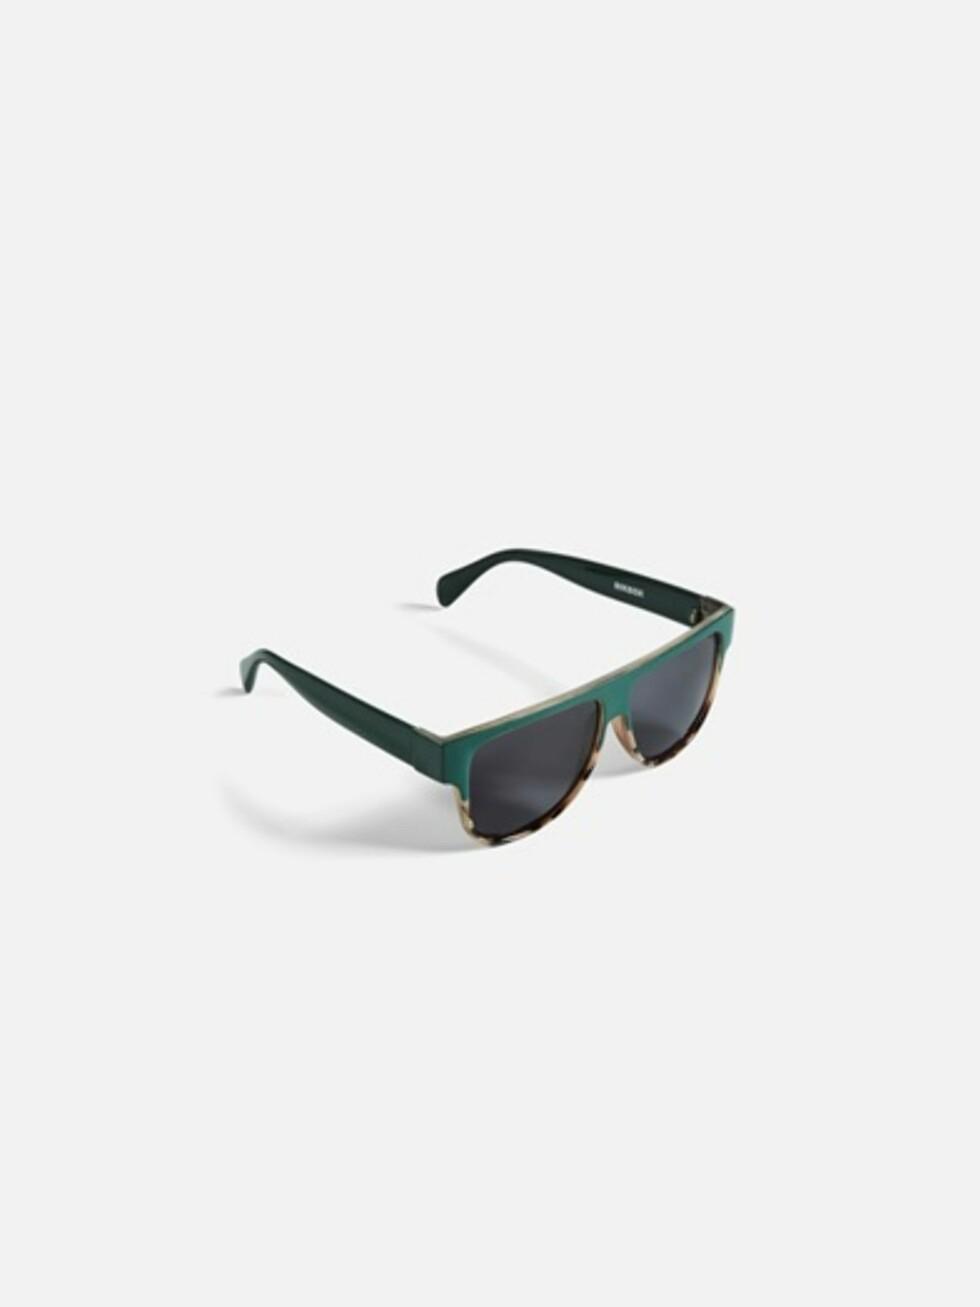 Solbriller fra Bik Bok   kr 99   https://bikbok.com/no/7194409_F780